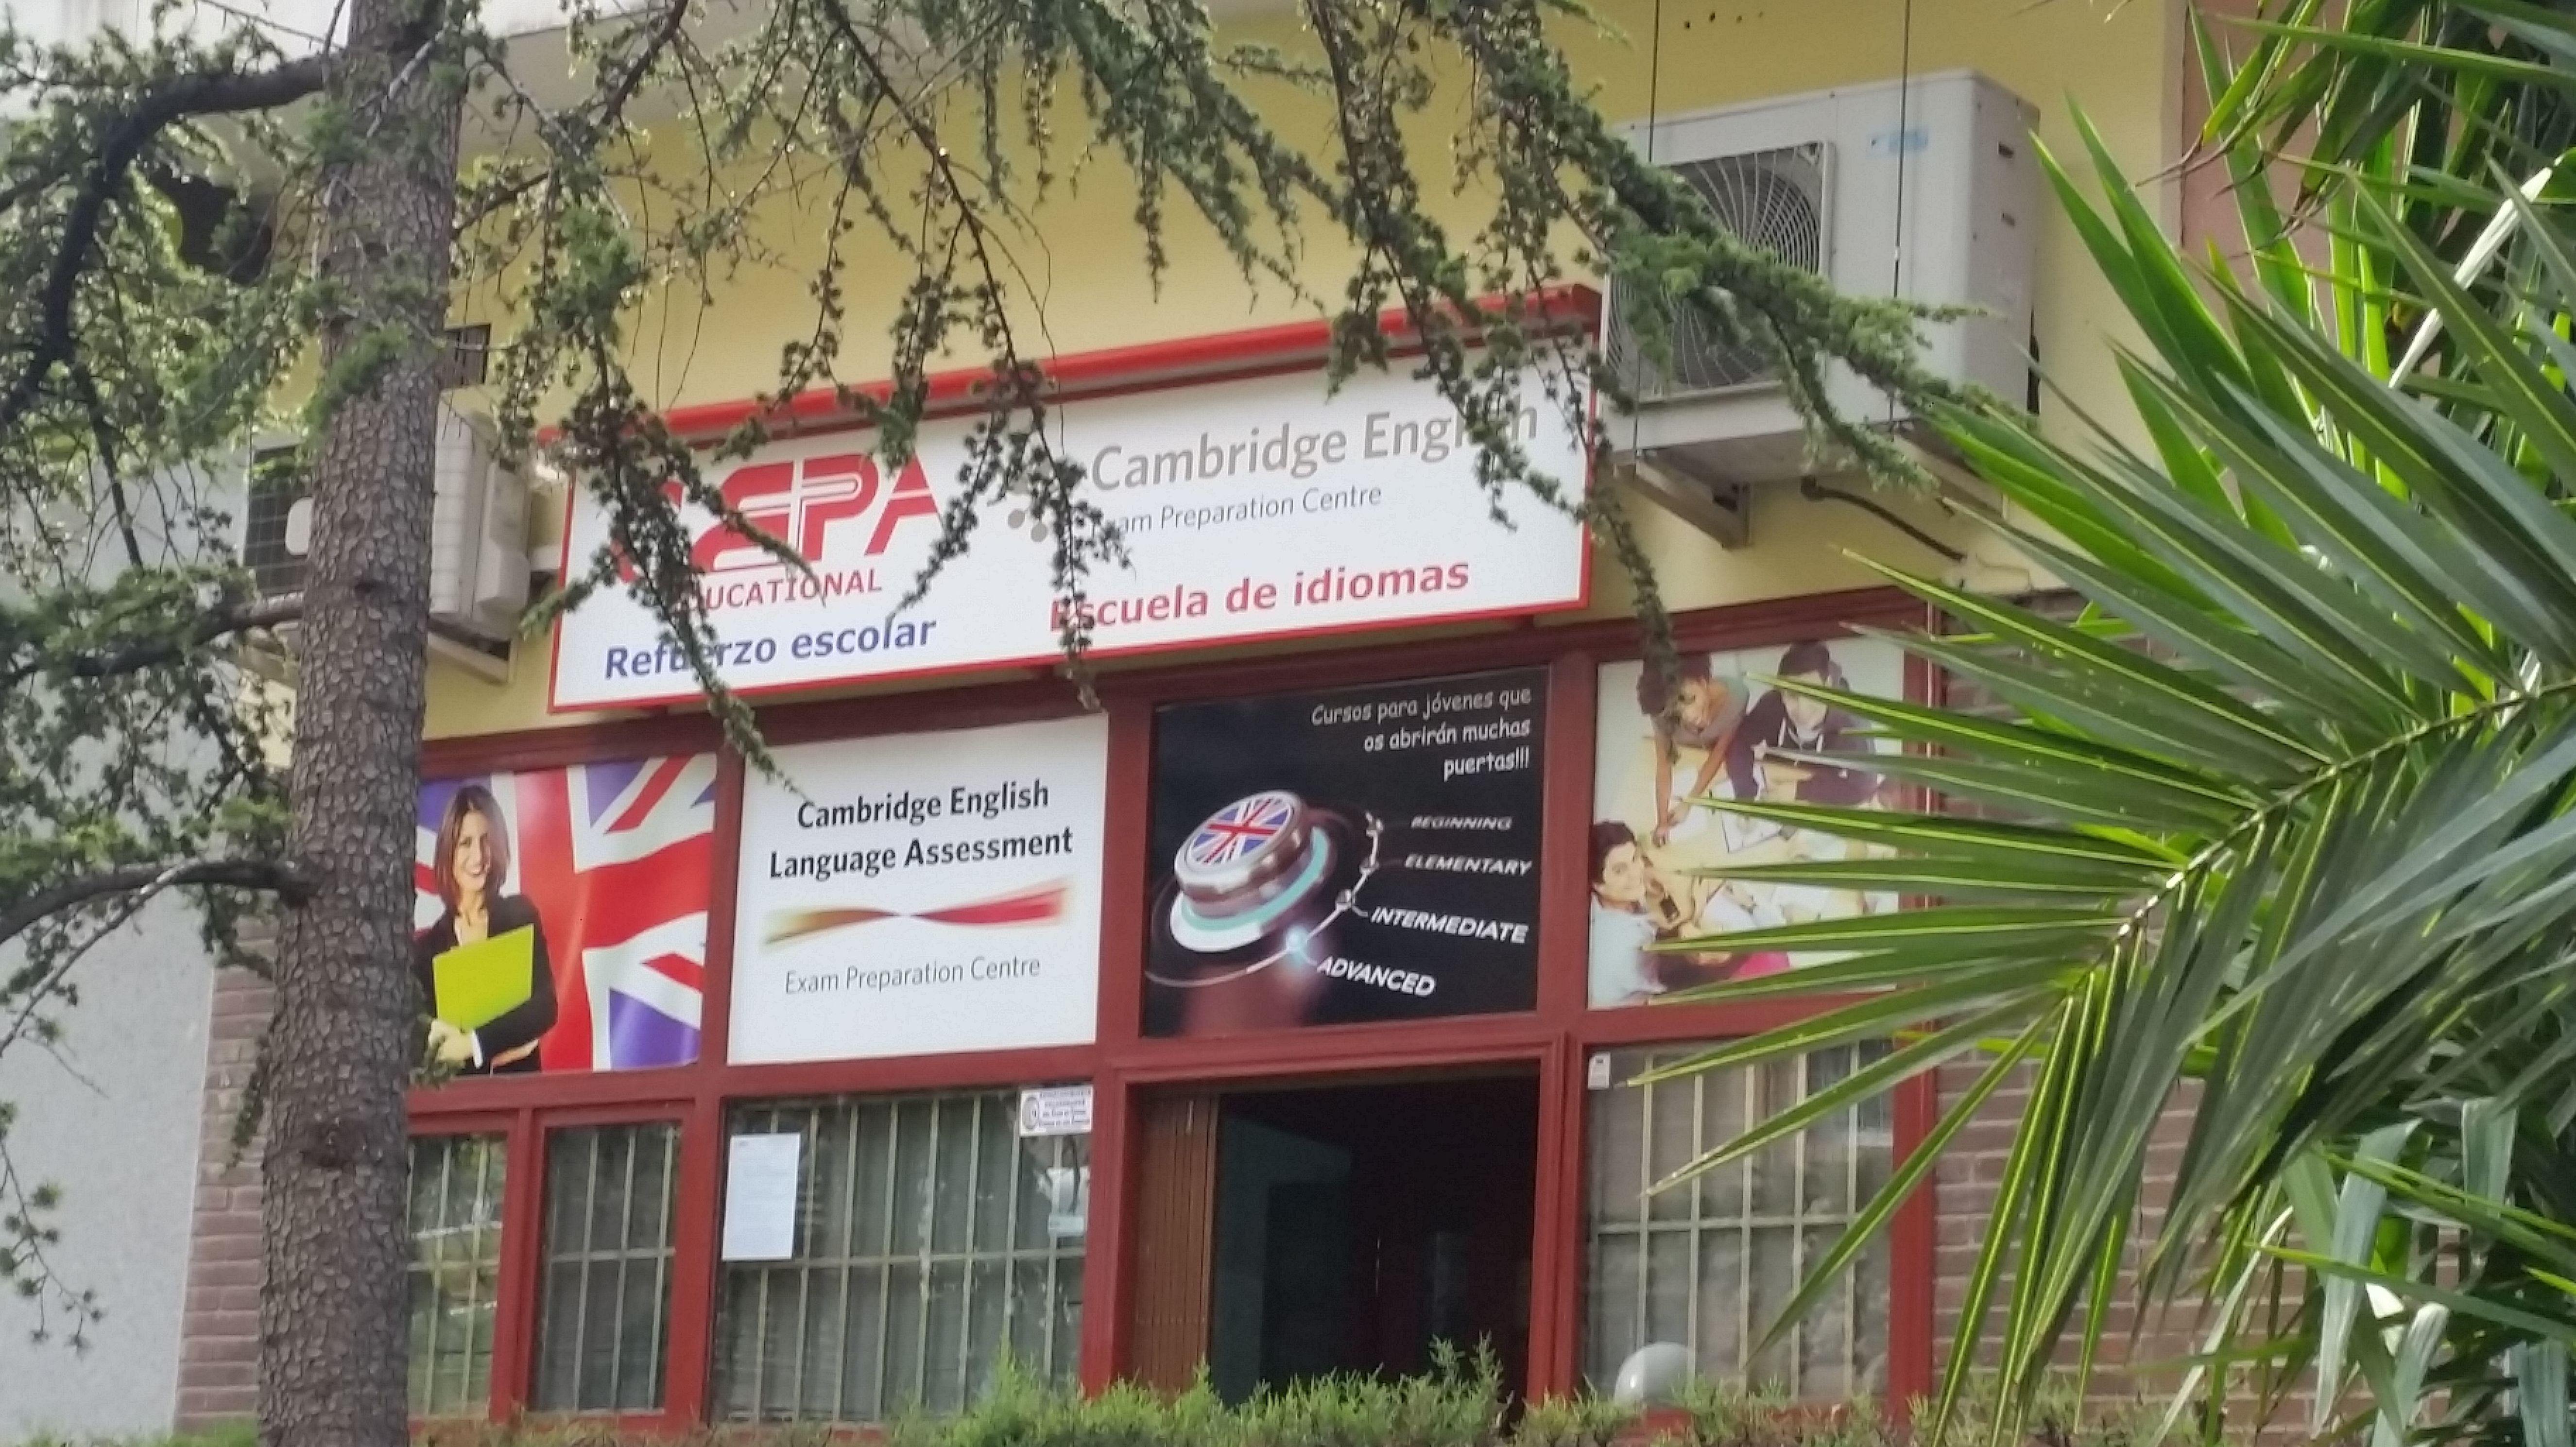 Centro de refuerzo escolar